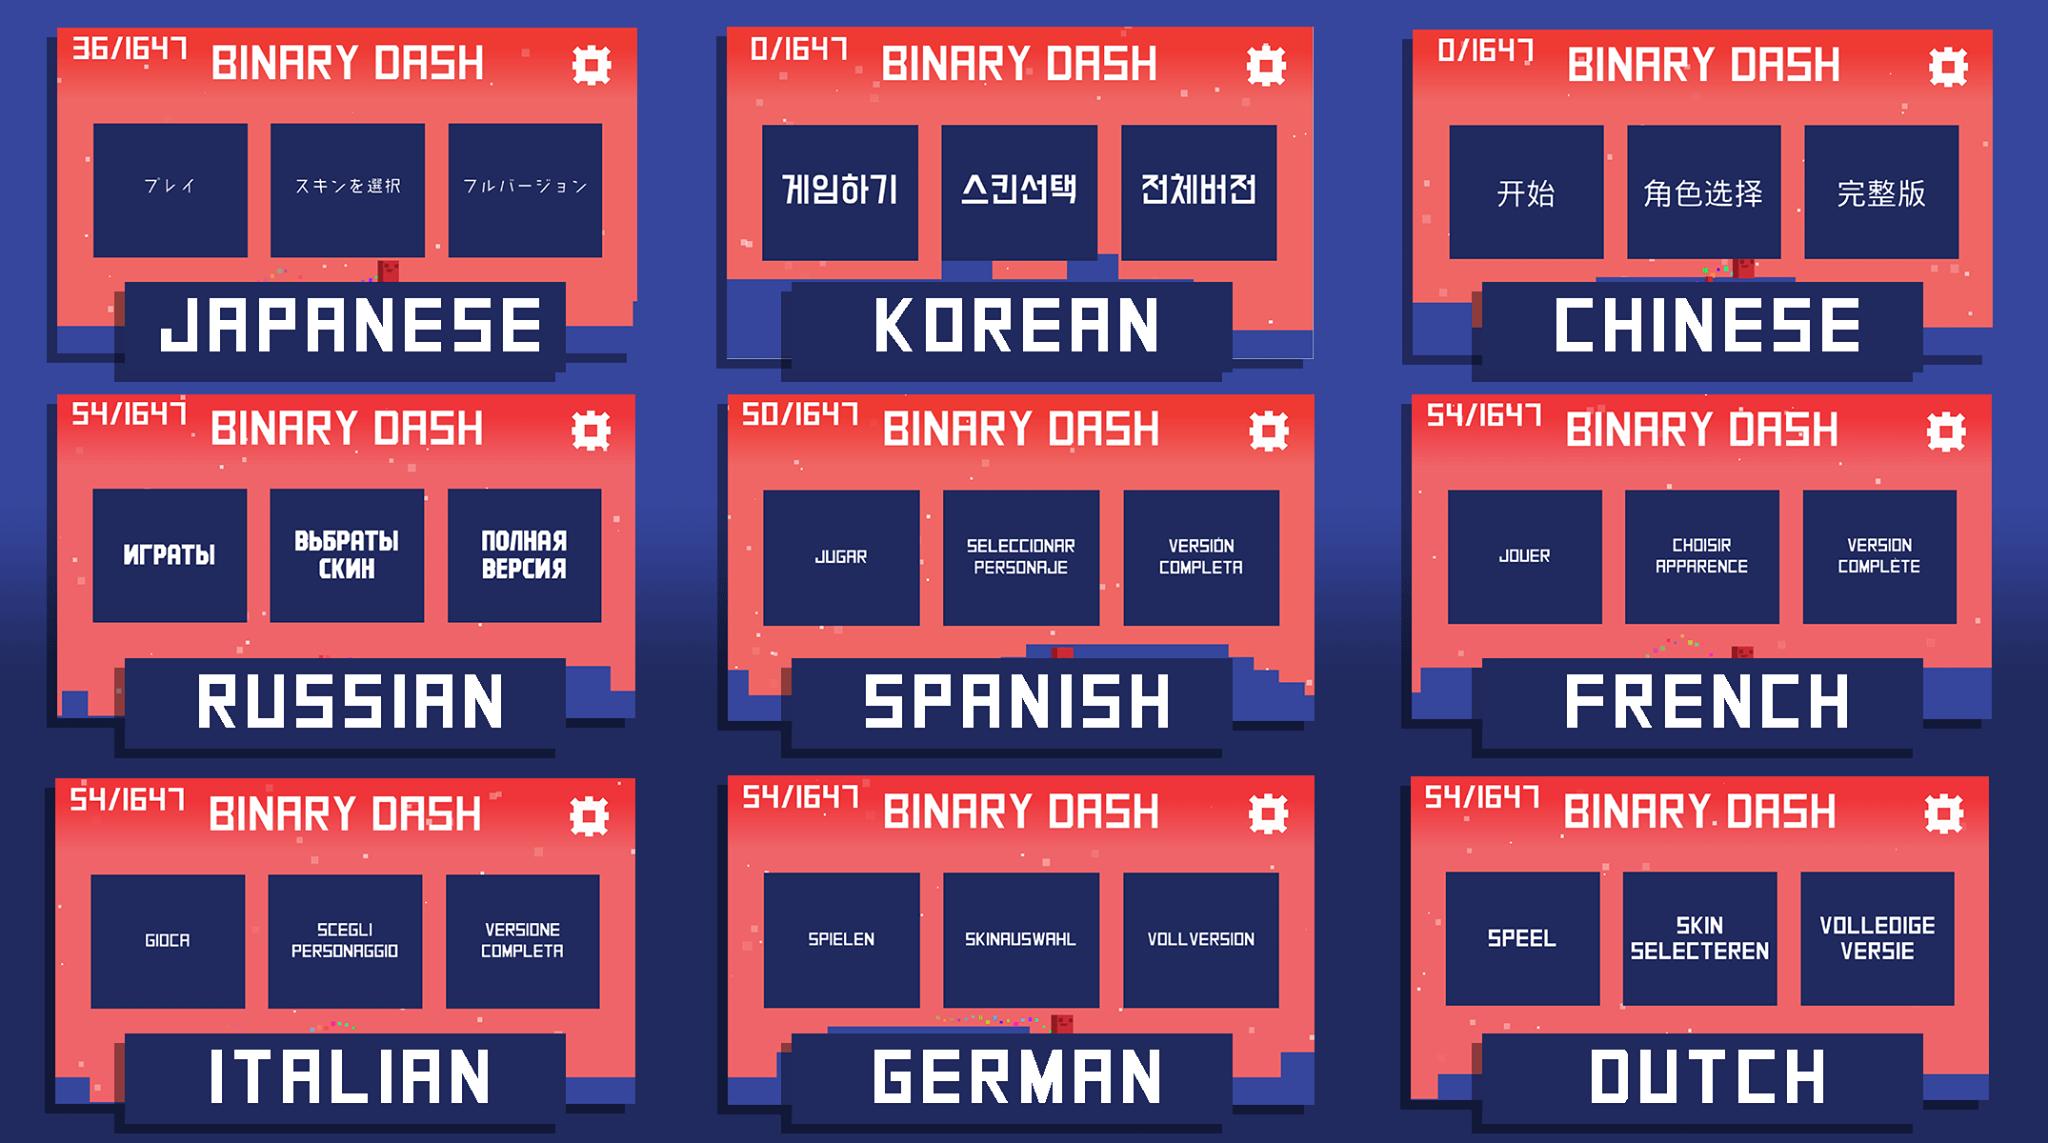 Binary Dash Languages